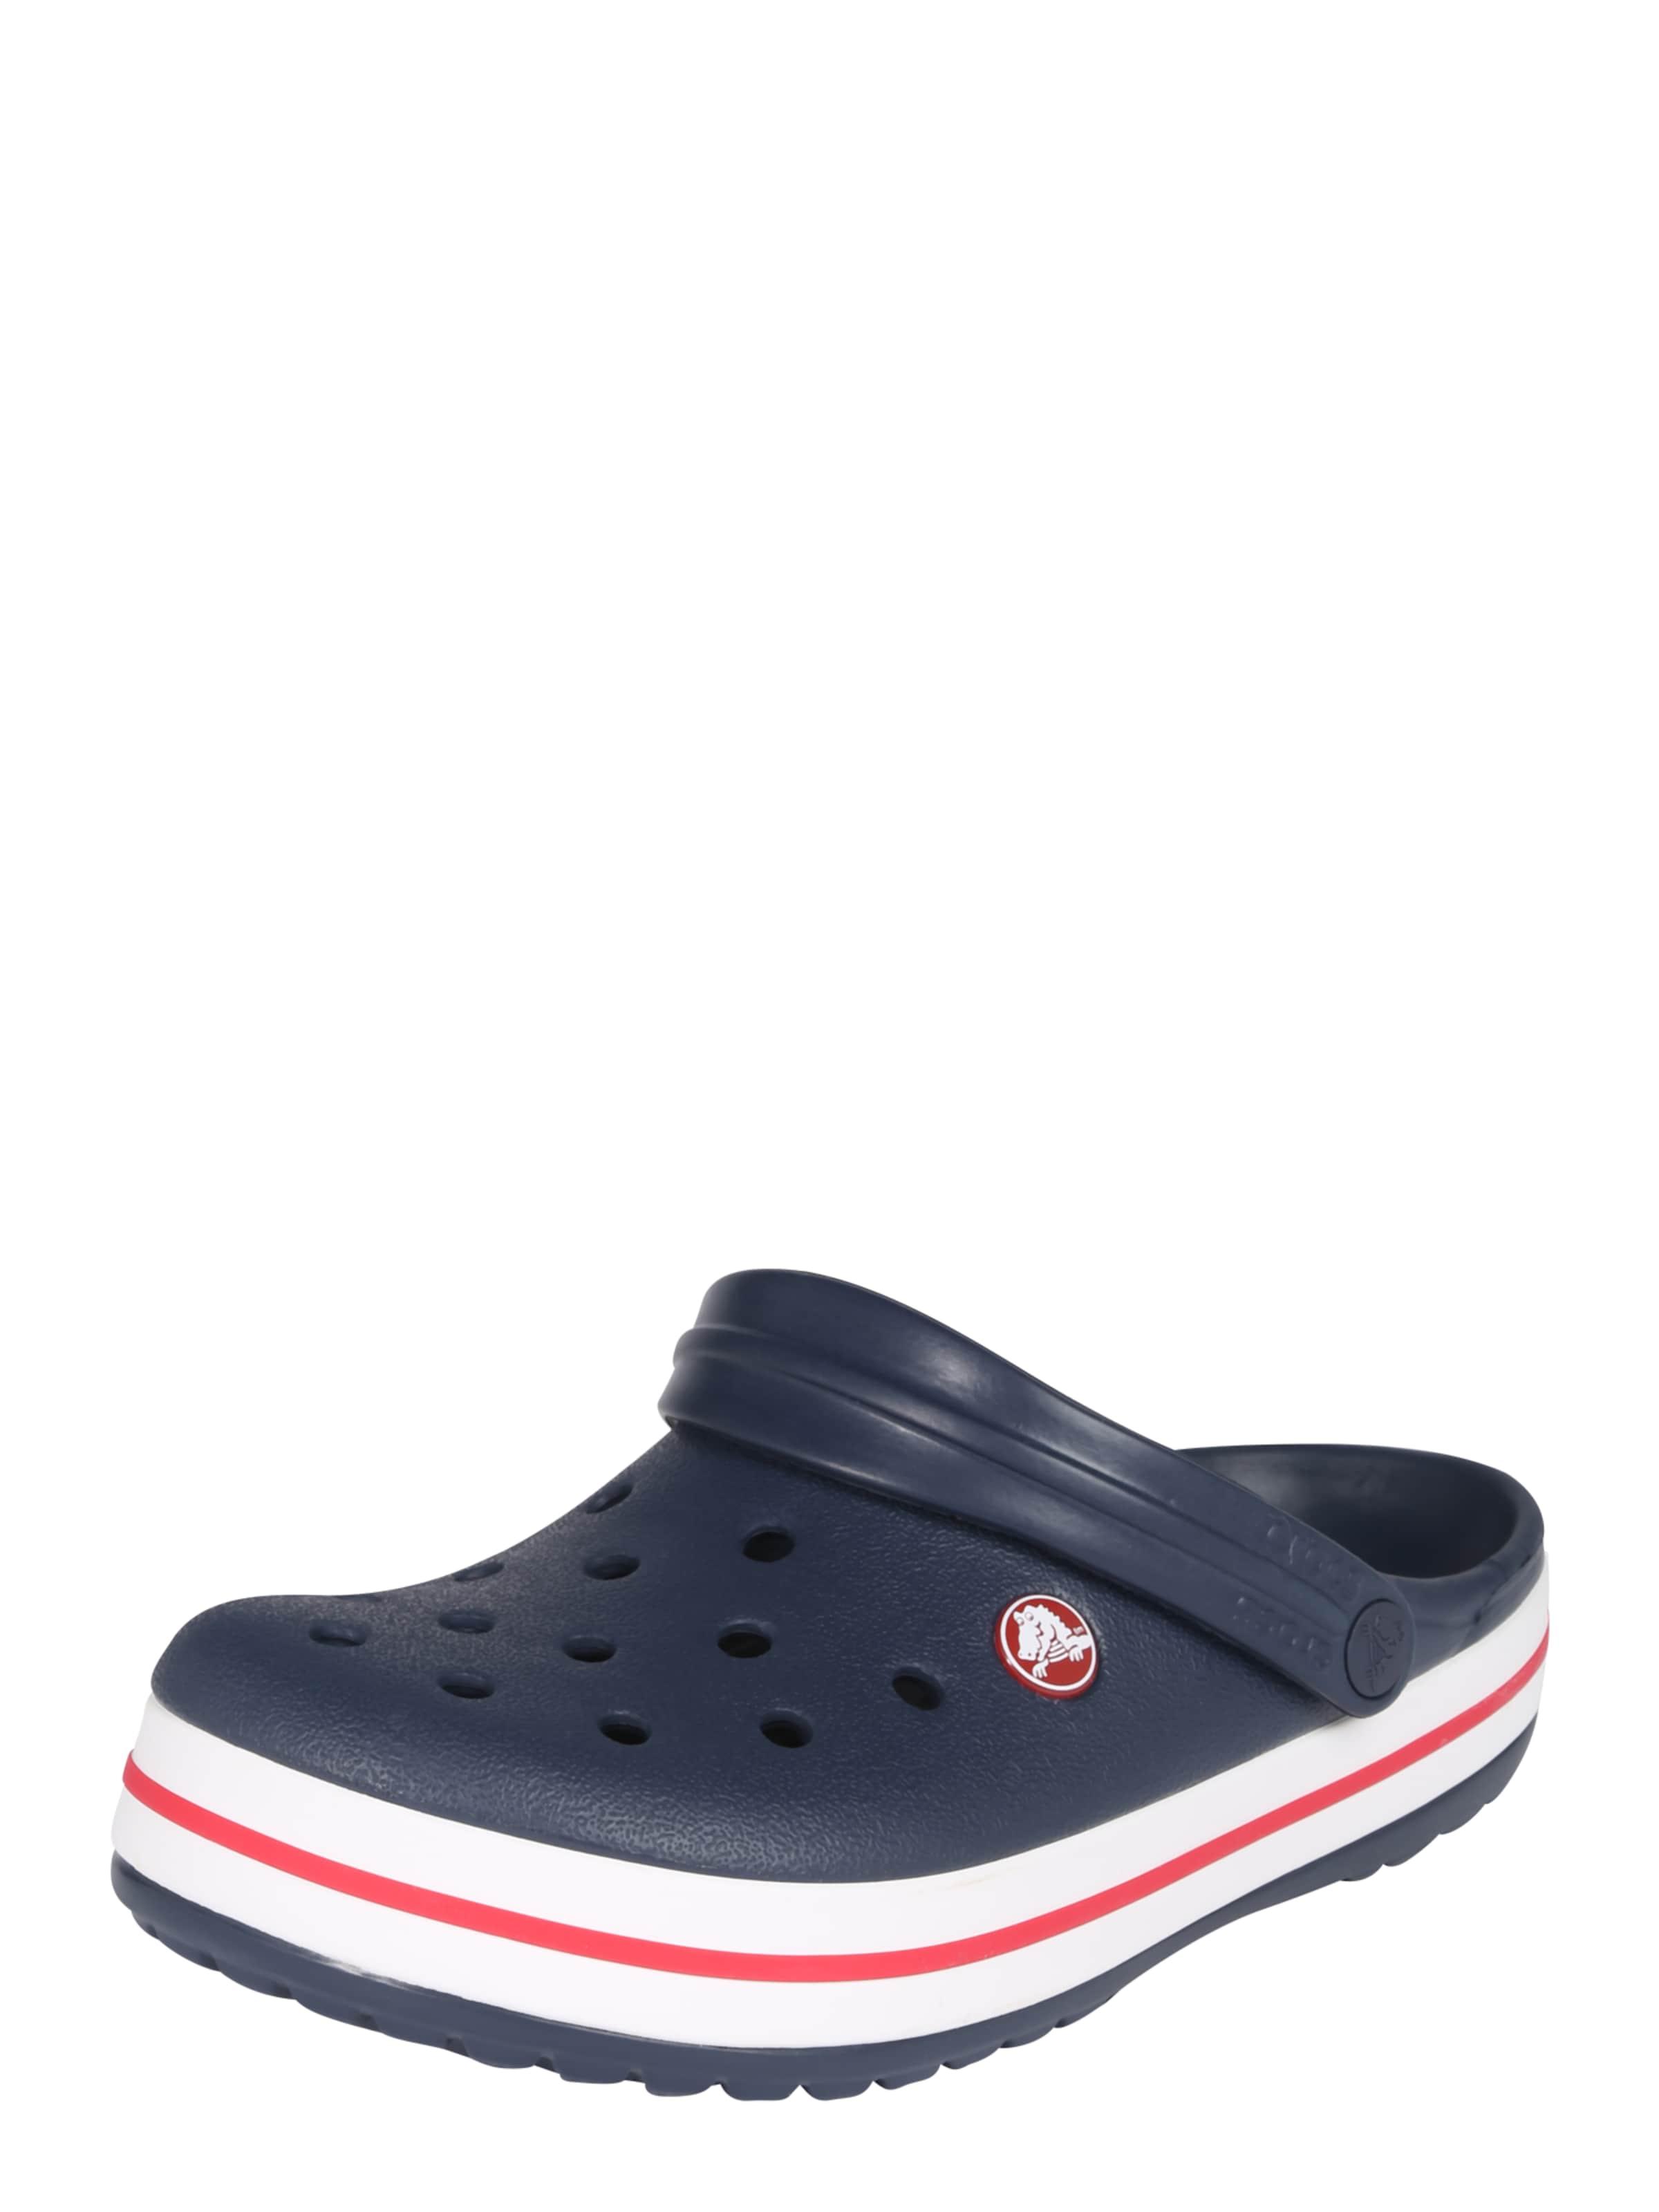 Pantolette Crocs Navy 'crocband' Pantolette 'crocband' In Crocs w0vN8nm